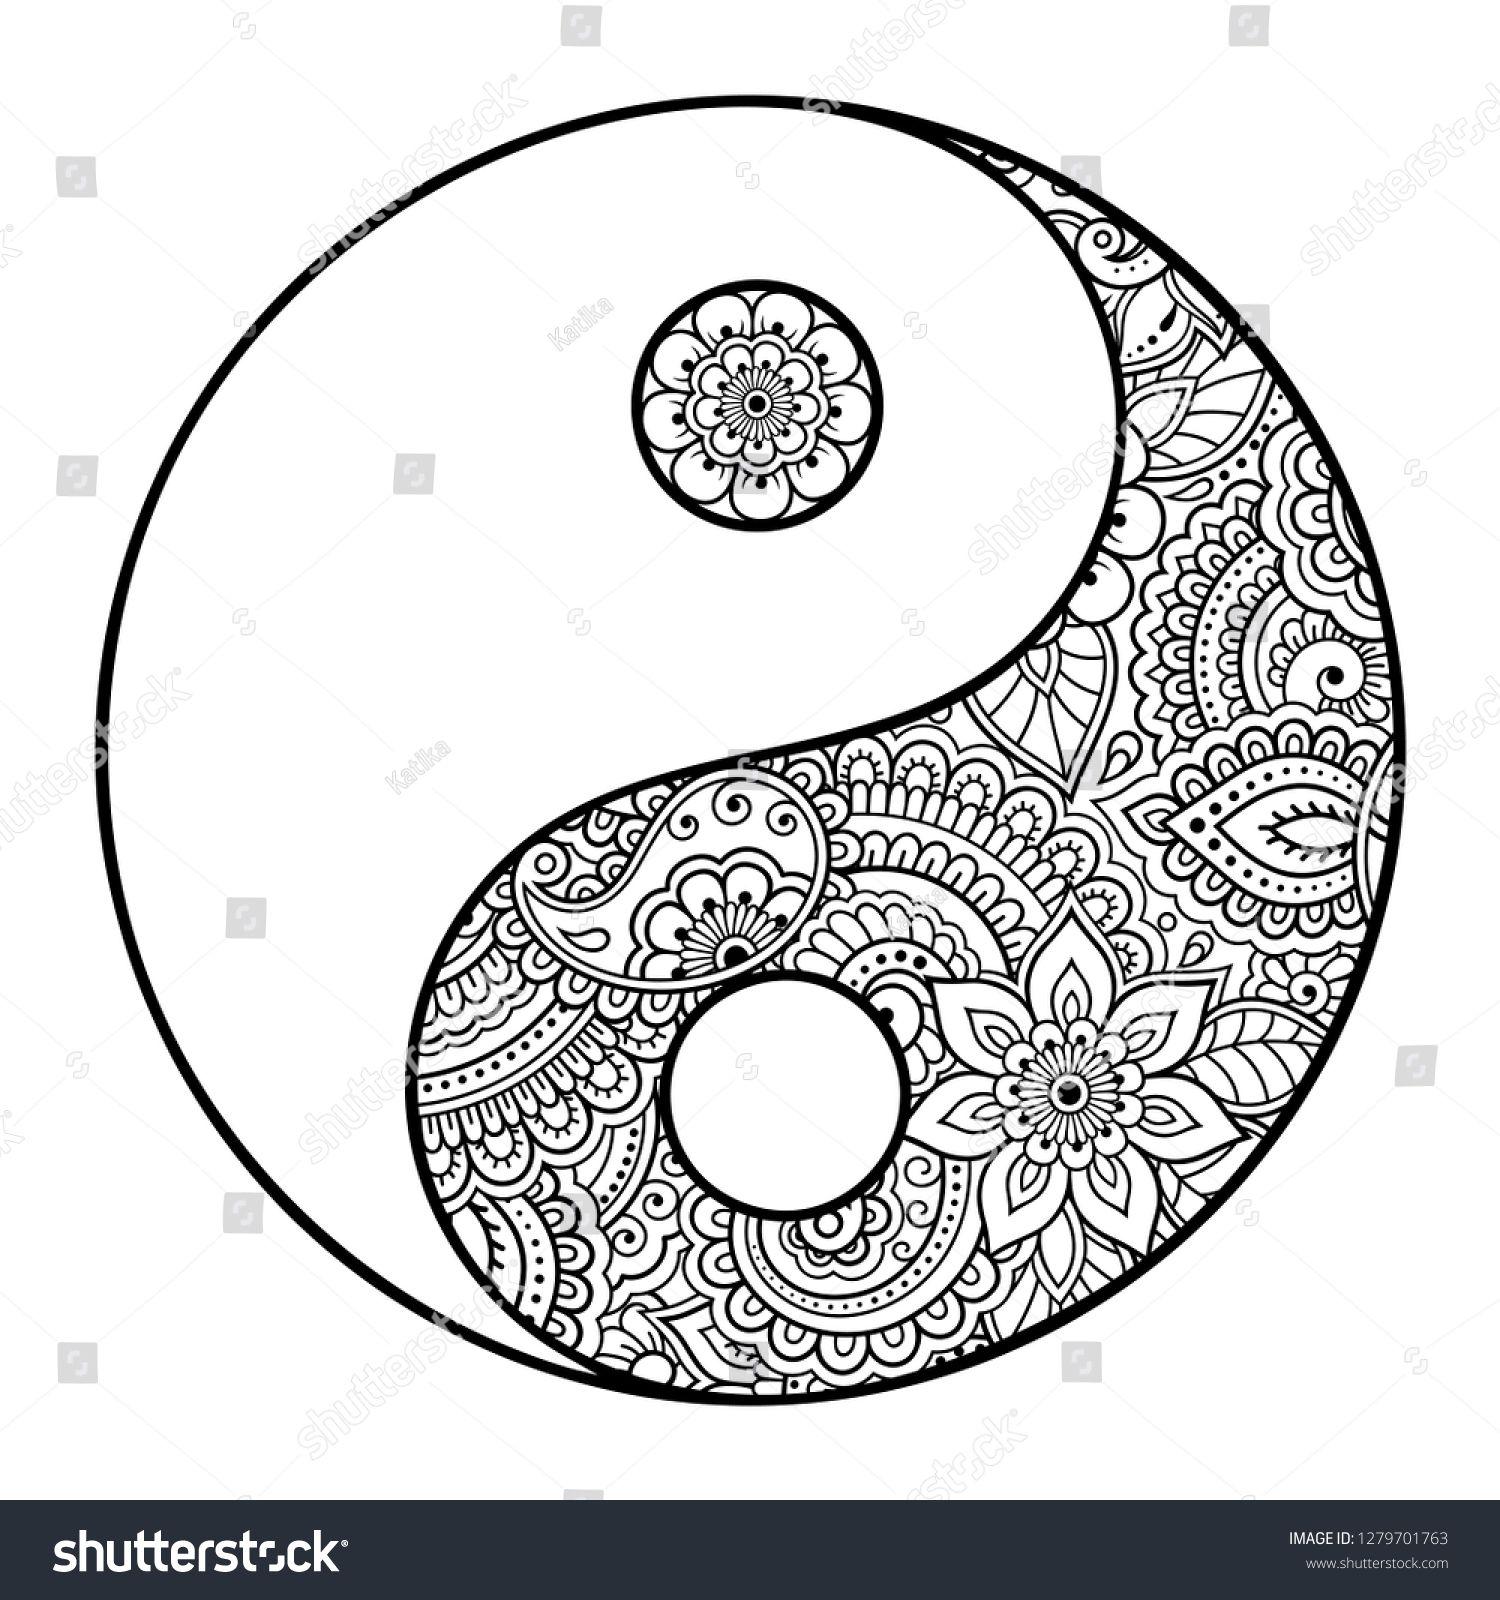 Yin Yang Hand Drawn Symbol Circular Pattern Sign Interaction Of Opposites For Mehndi Henna And Tattoo Decor Mandala Design Art Yin Yang Art Zen Doodle Art